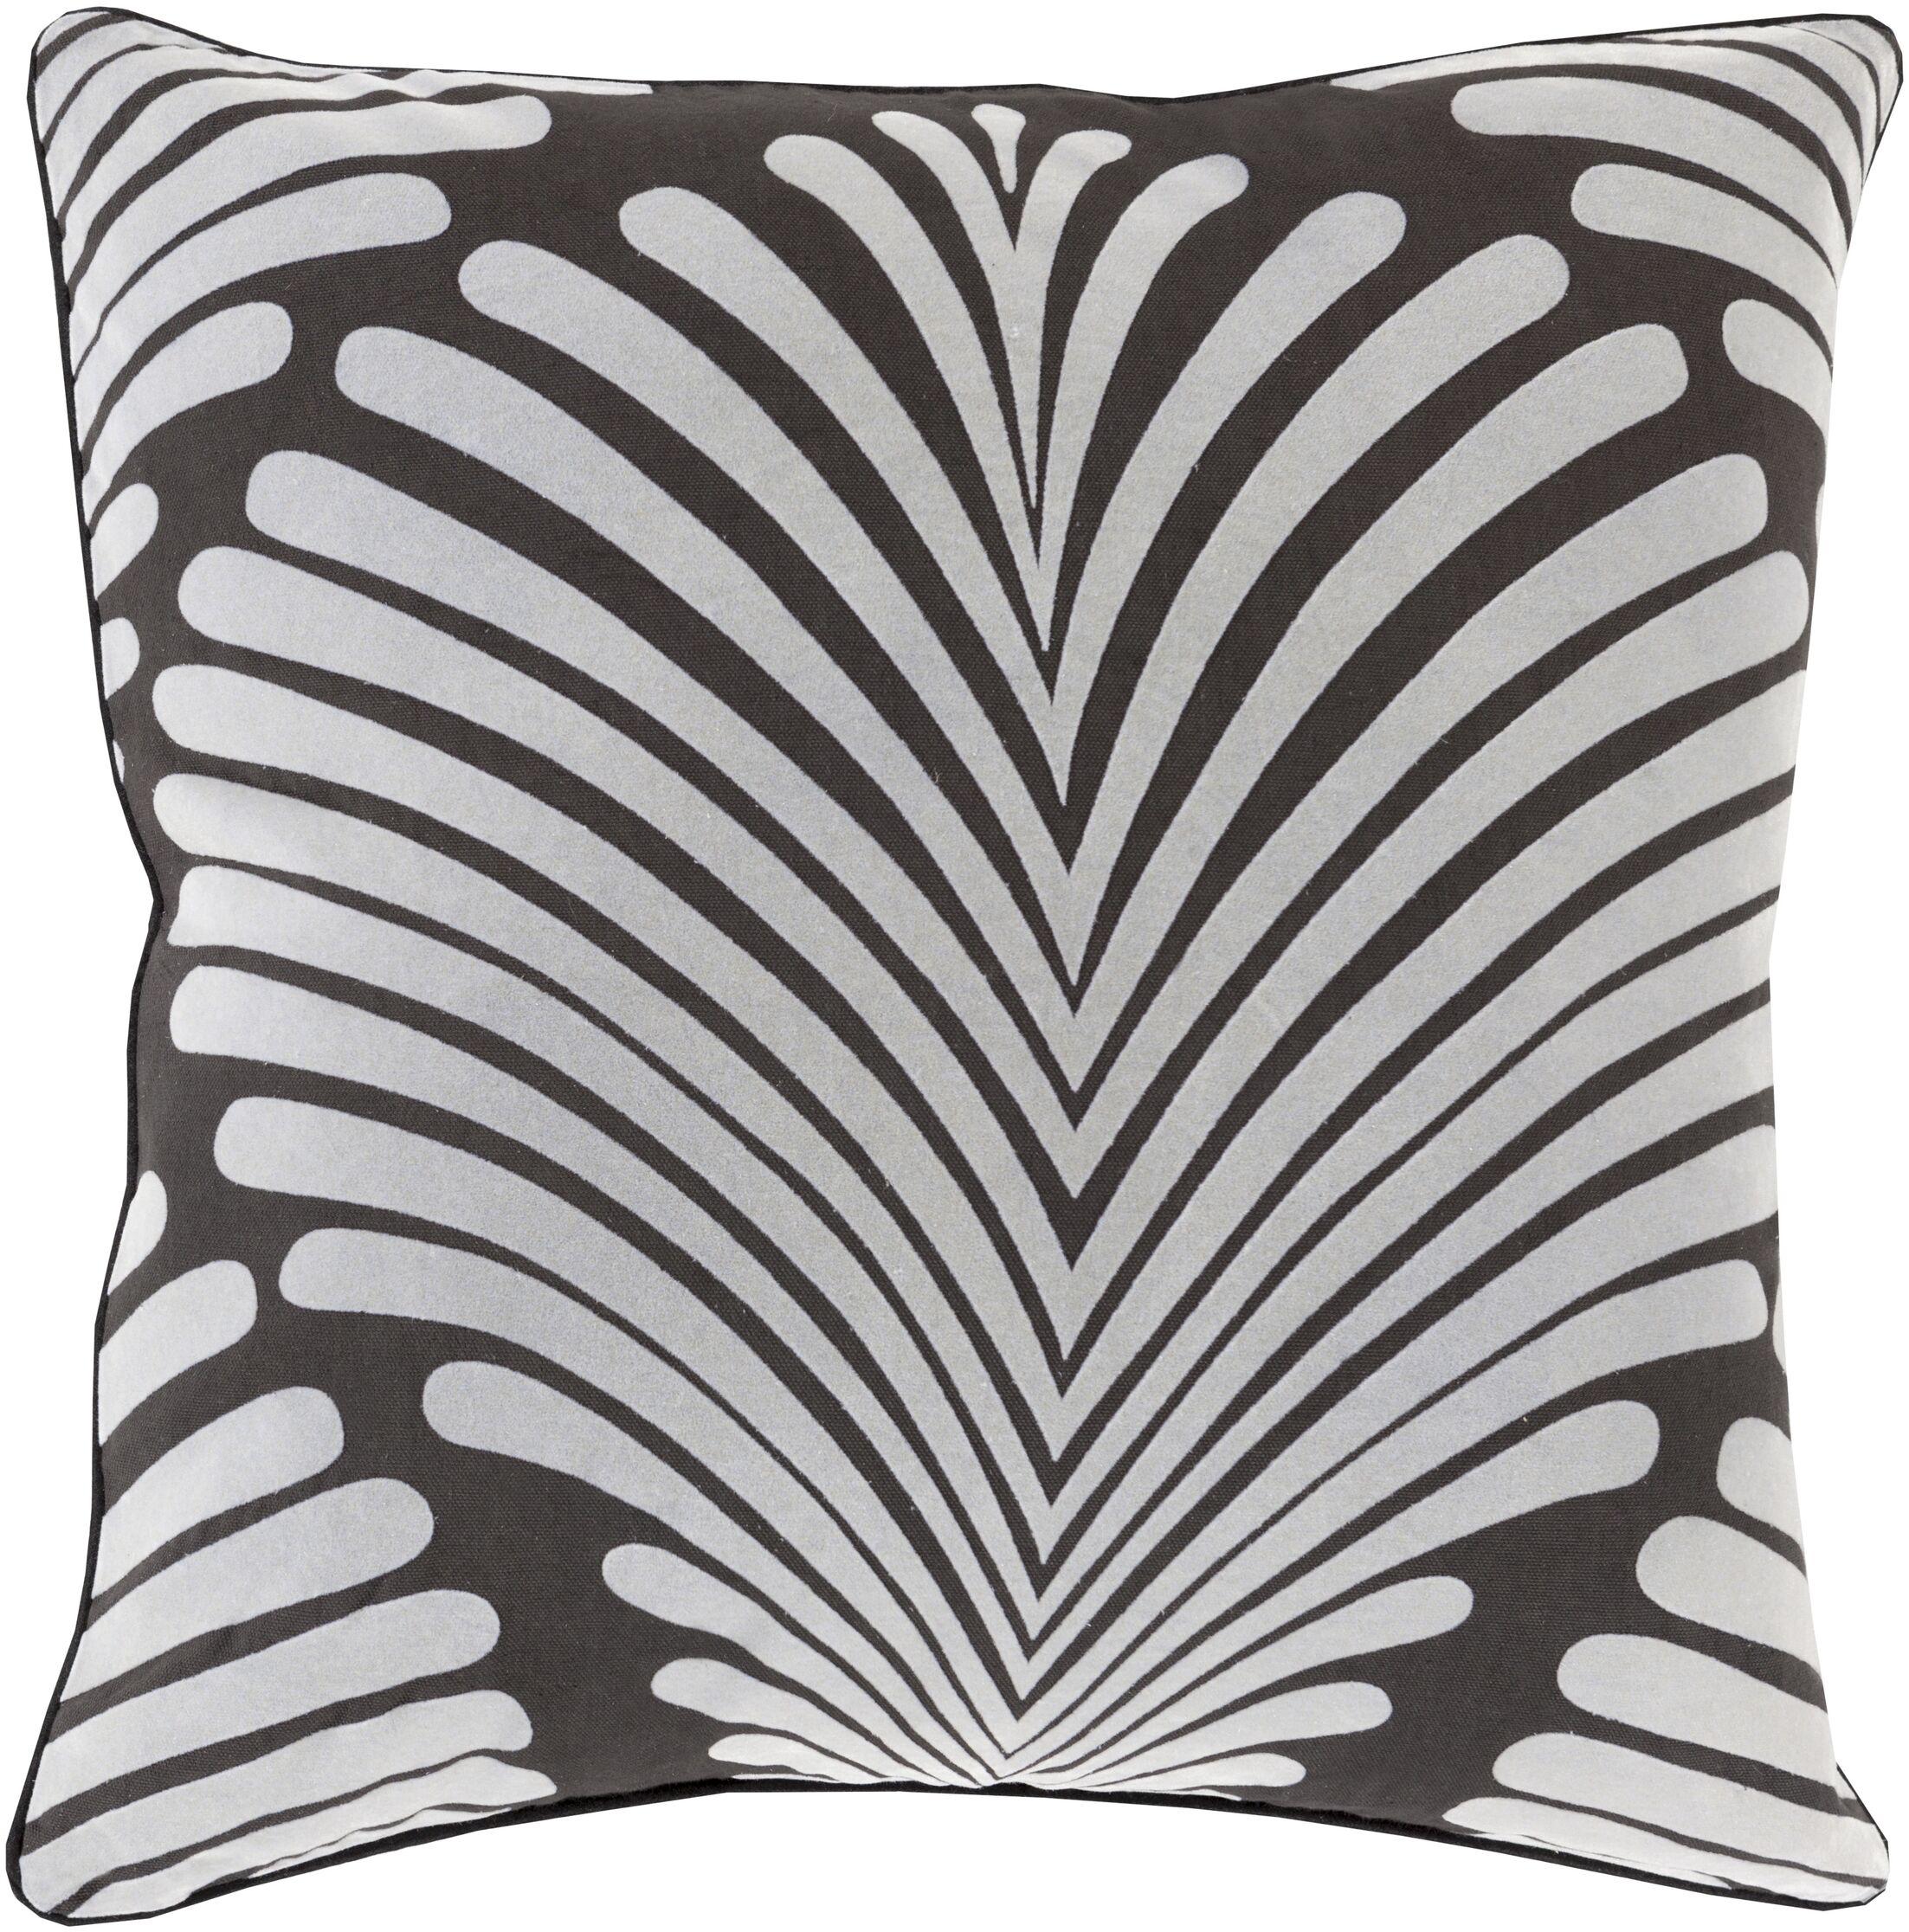 Linda Cotton Throw Pillow Color: Charcoal/Gray, Size: 22